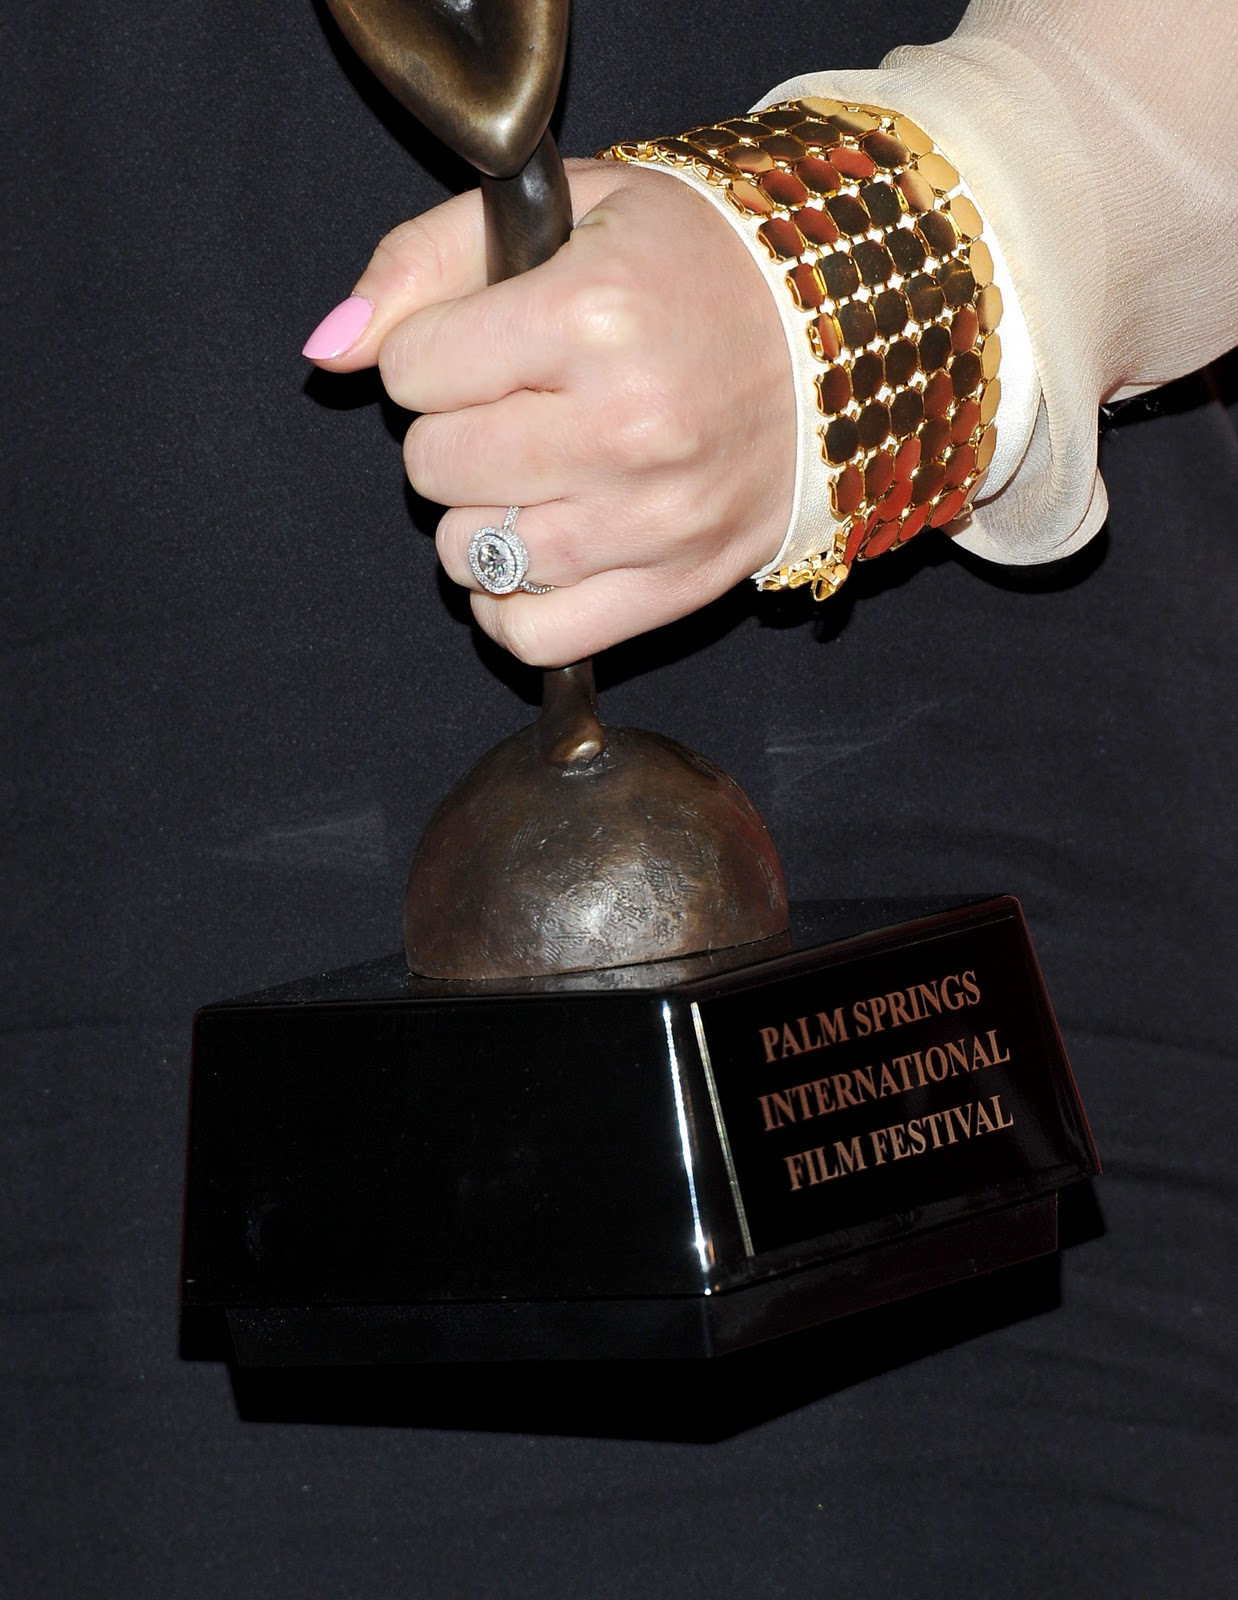 http://1.bp.blogspot.com/_q8fPW7CWGEc/TSumHhadFzI/AAAAAAAAAPE/GzCxZzDJs1g/s1600/Natalie+Portman+Double+Halo+Engagement+Ring.jpg